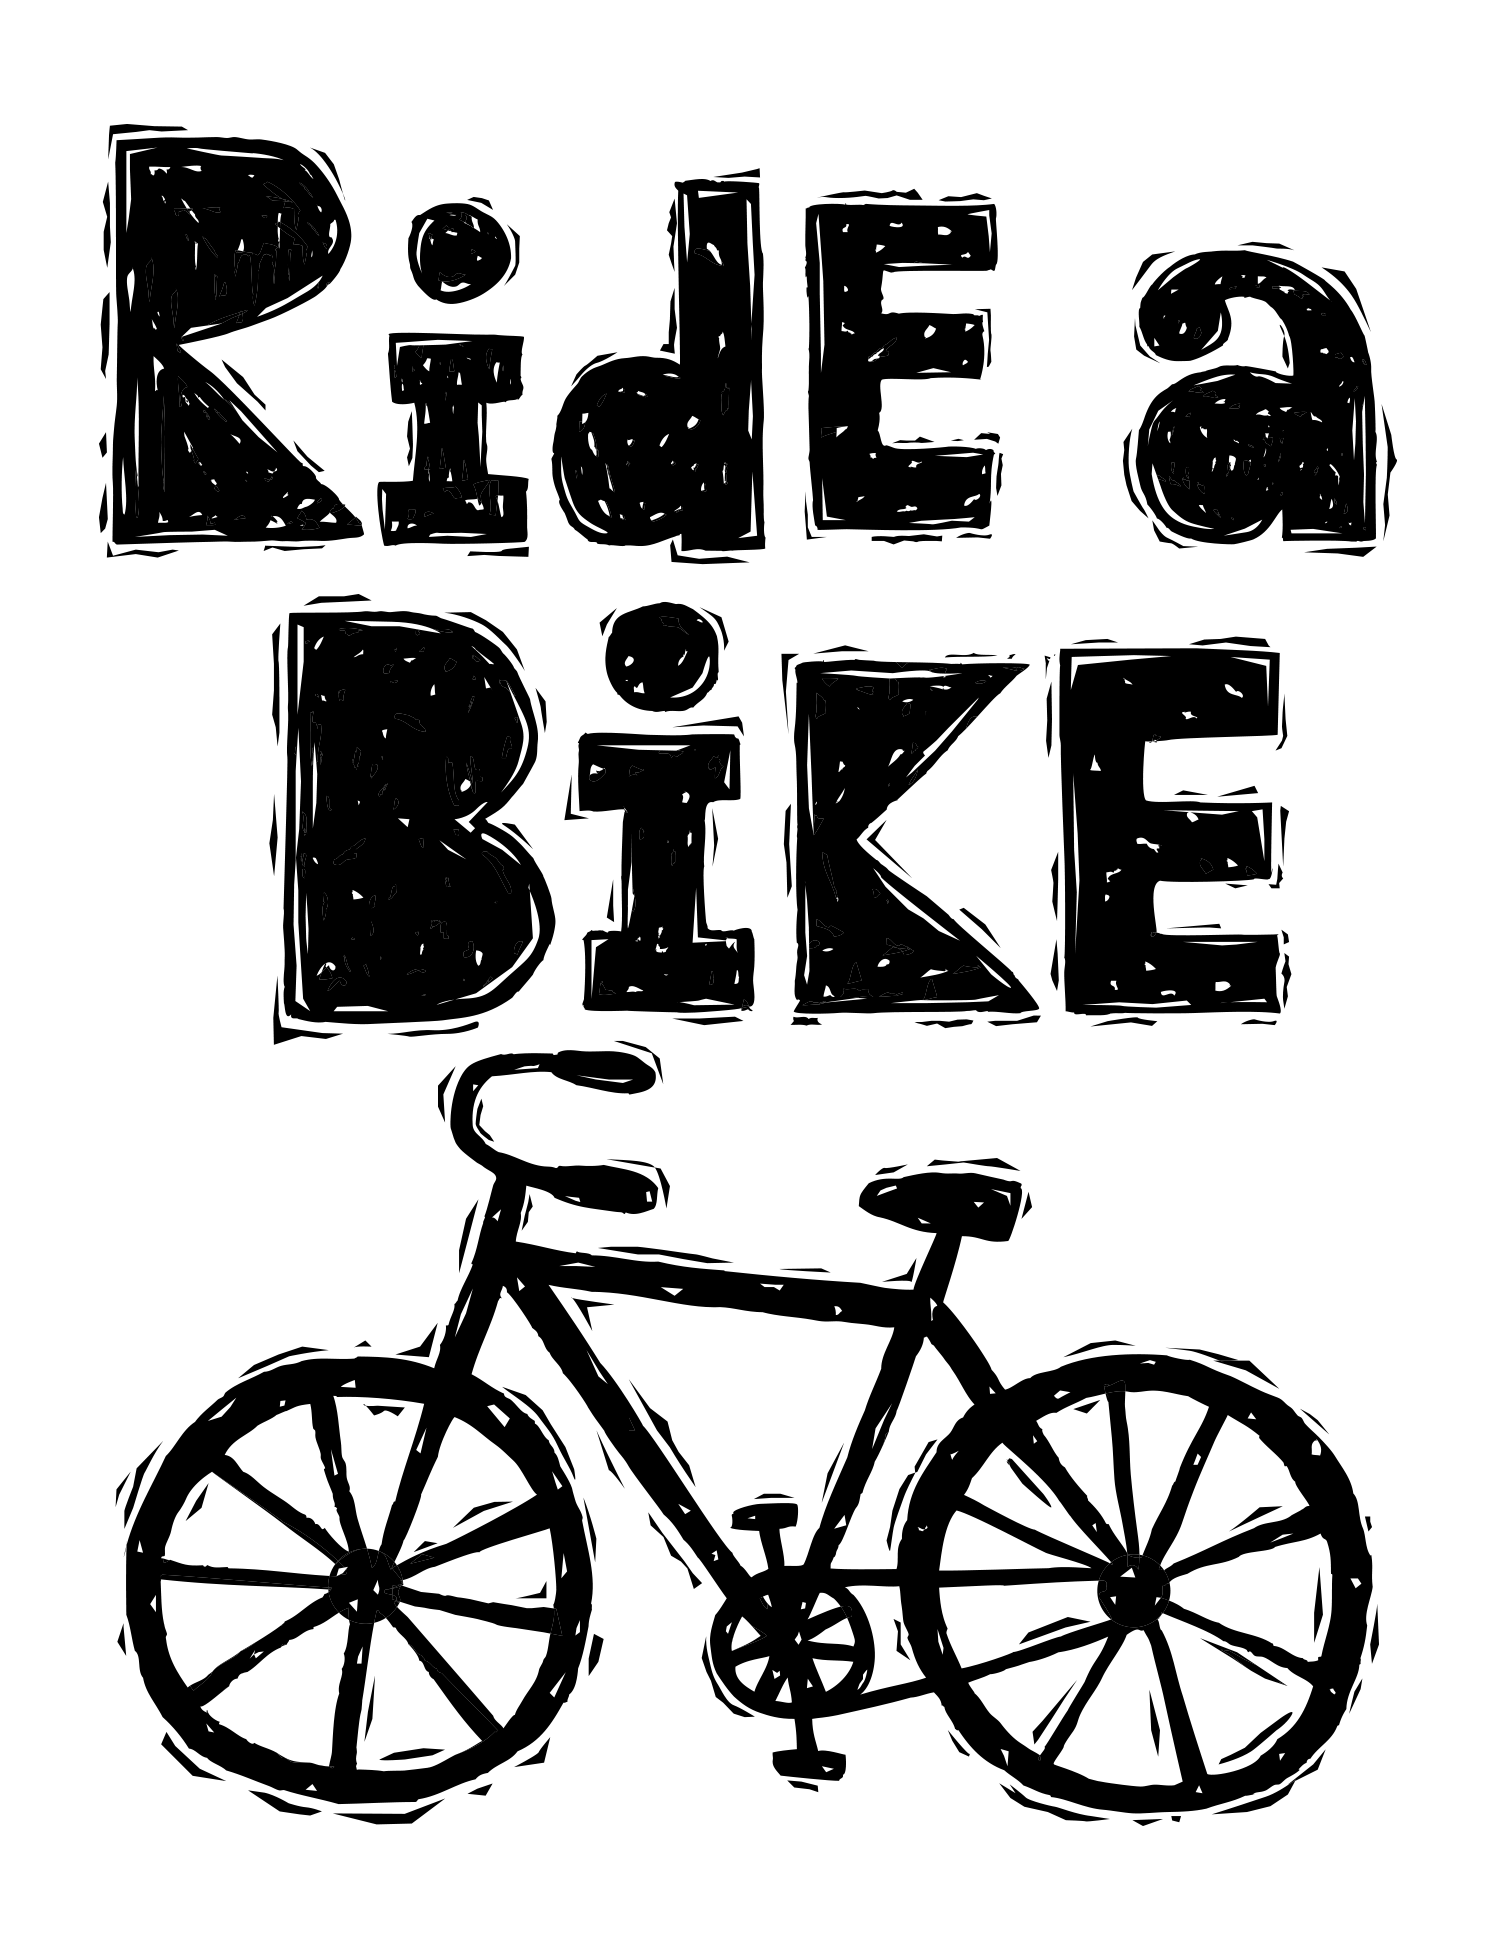 ride_a_bike_sketchy_bl_andi_bird.png